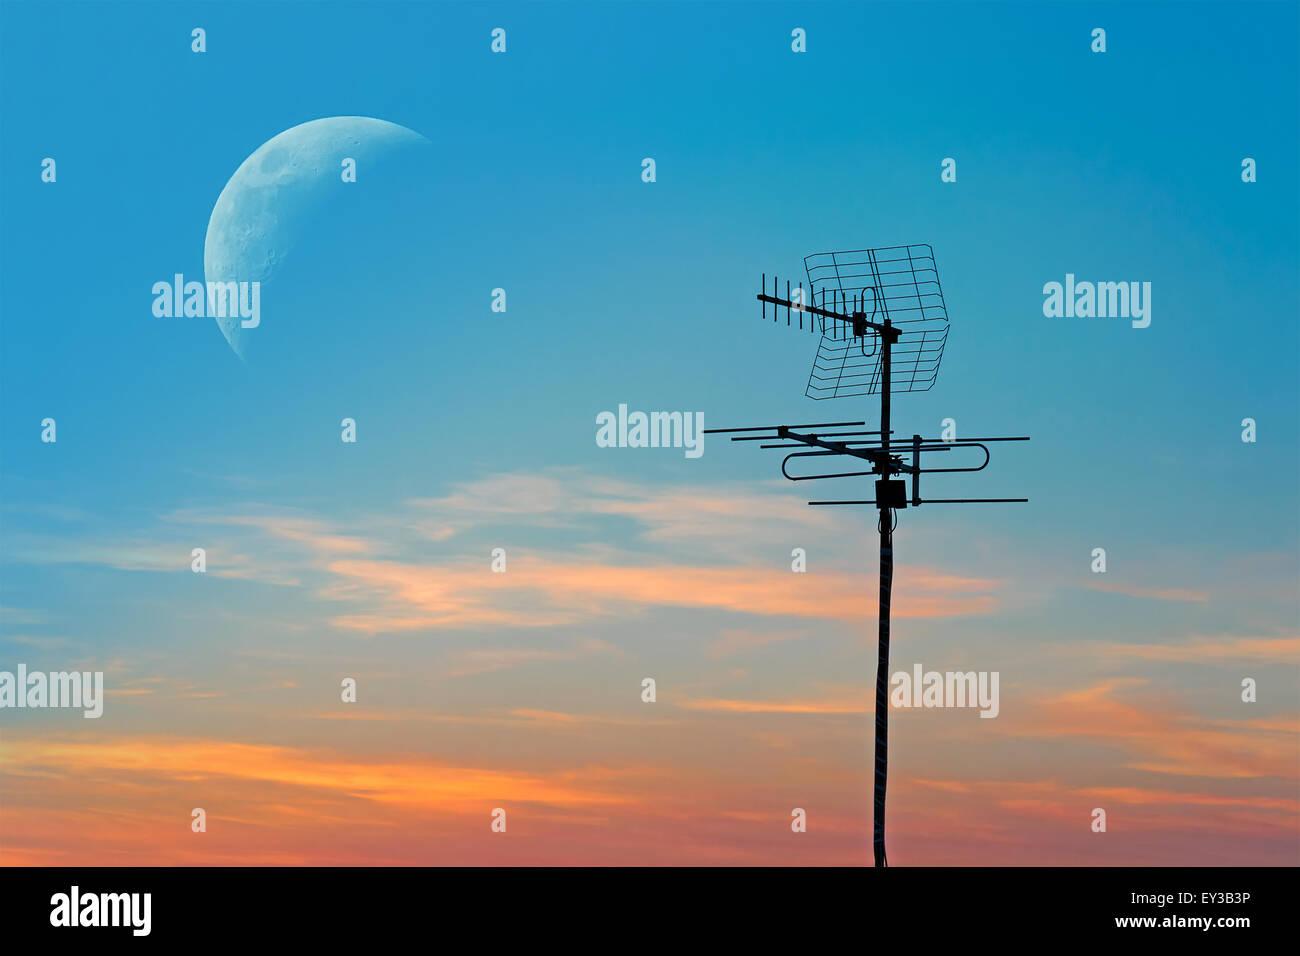 tv antenna under a huge moon at dusk - Stock Image